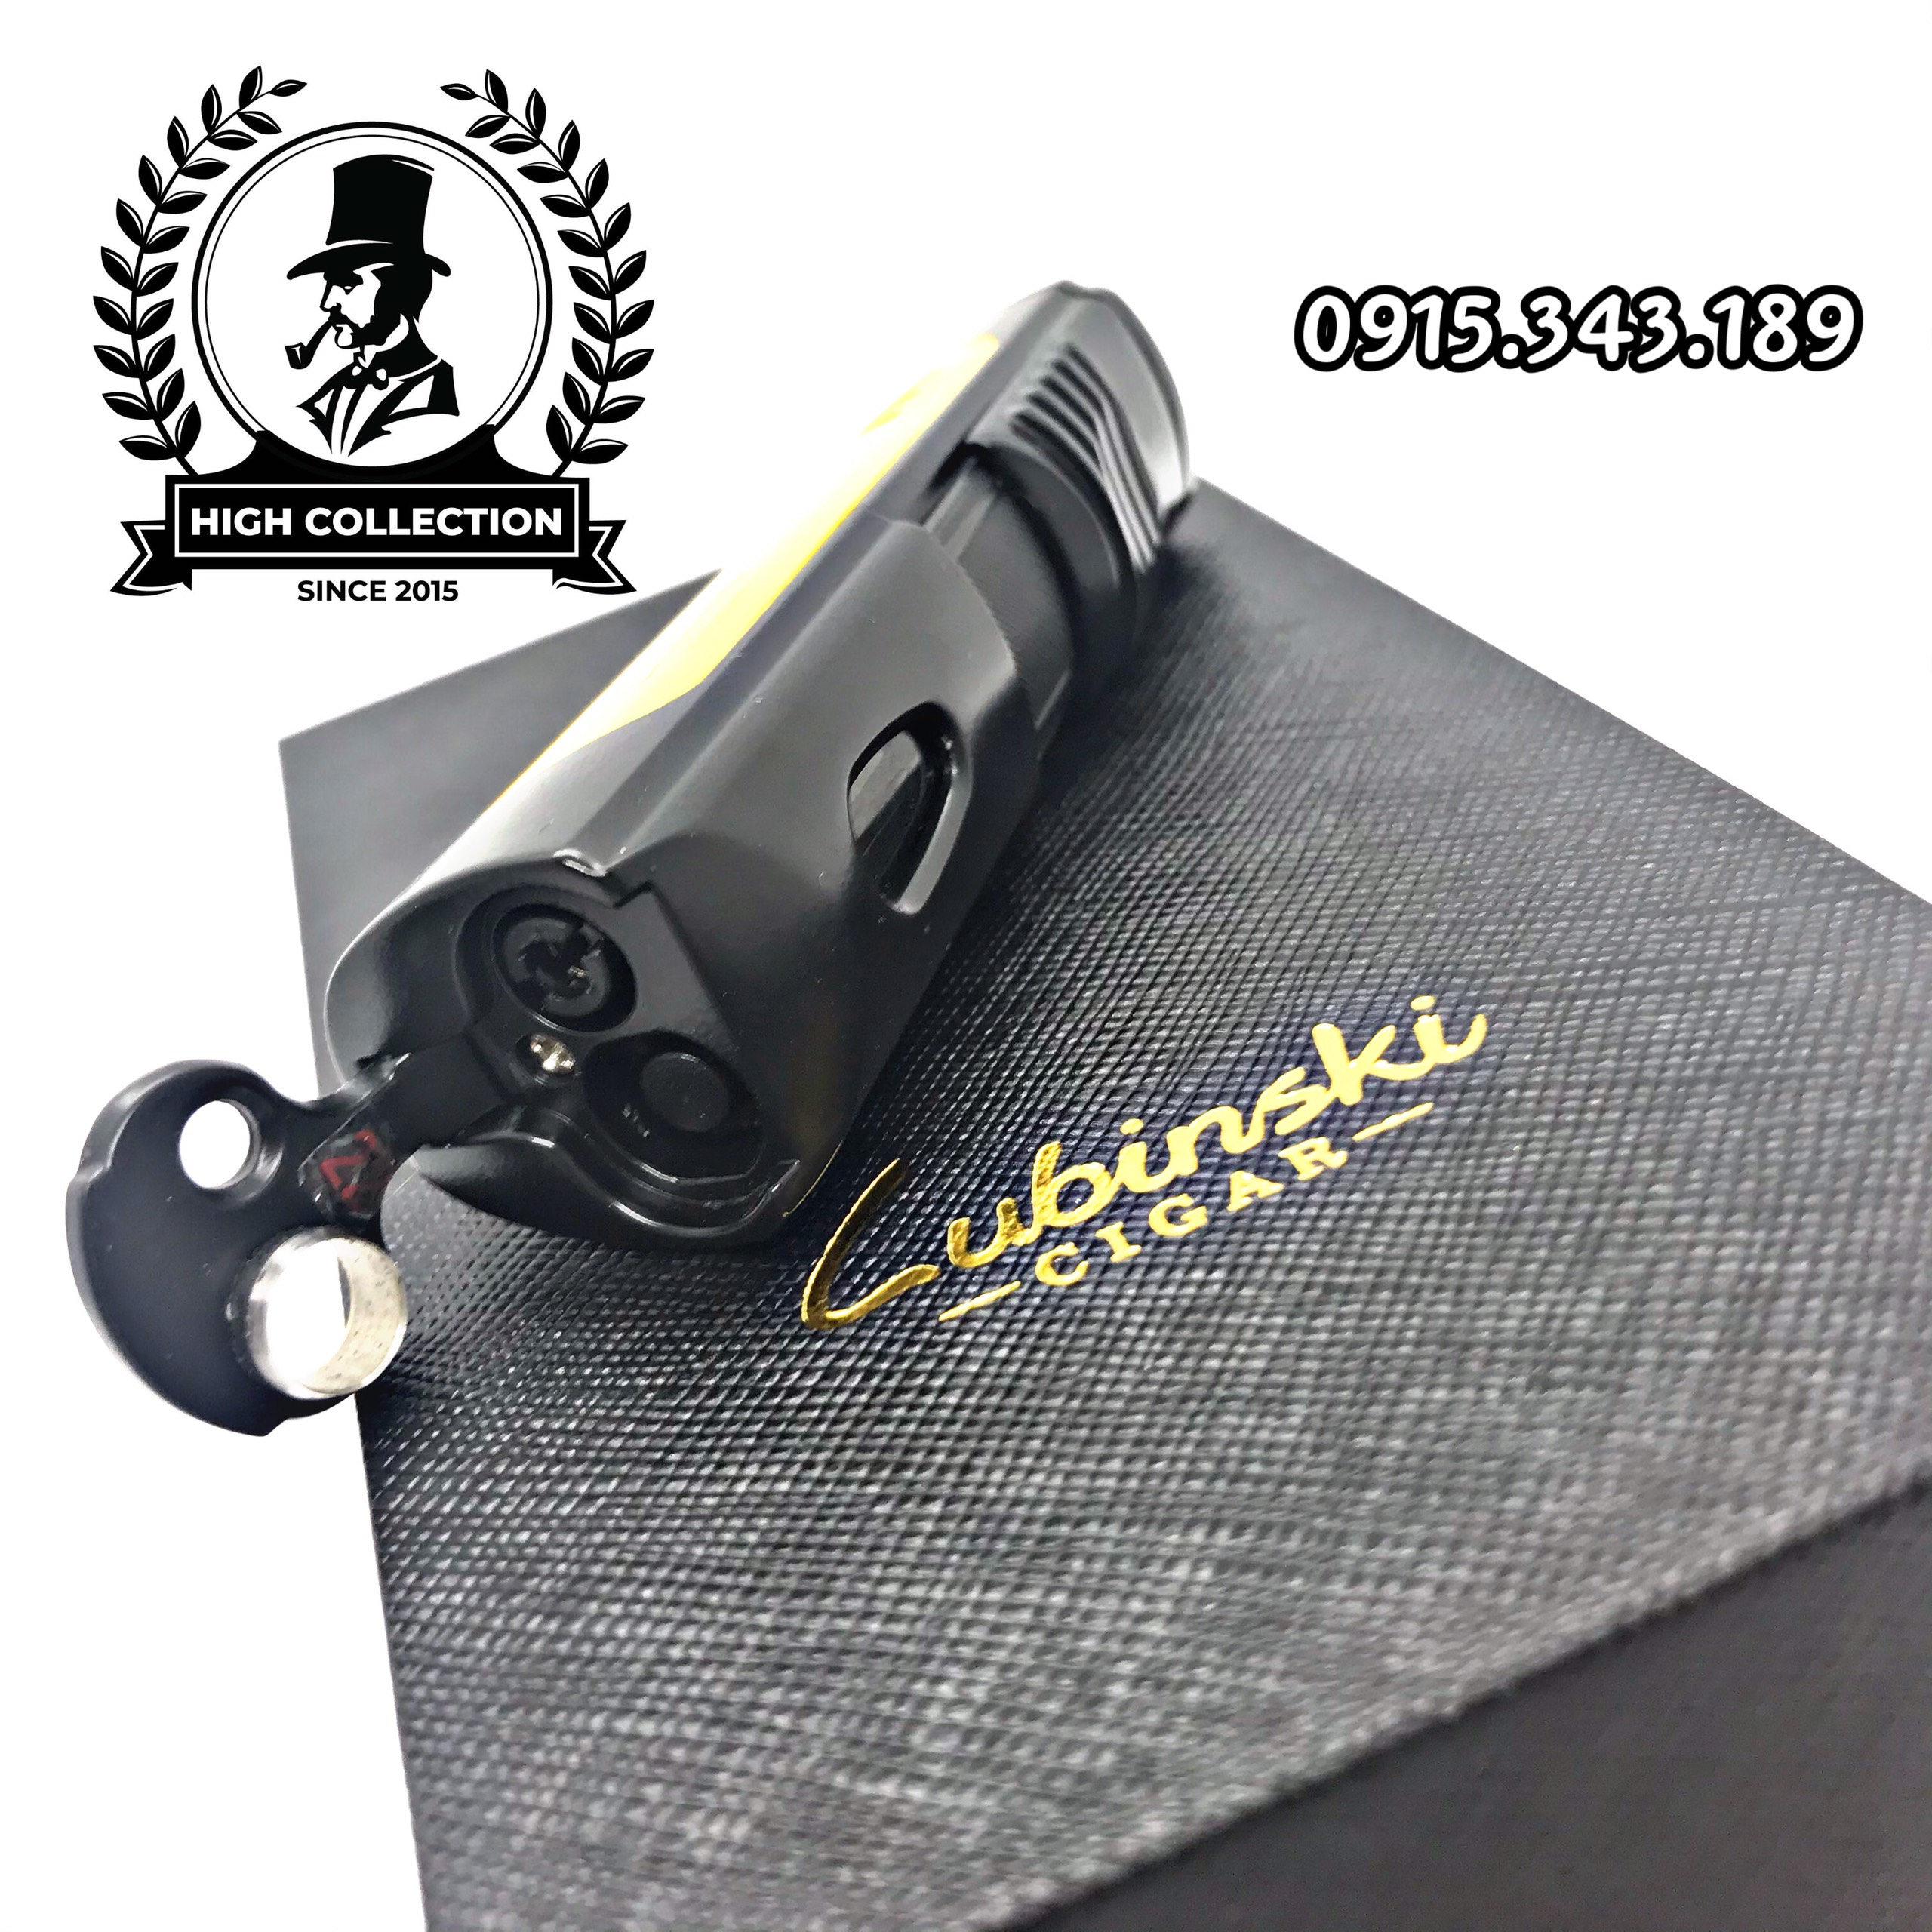 bật lửa cigar lubinski 1 tia 10013